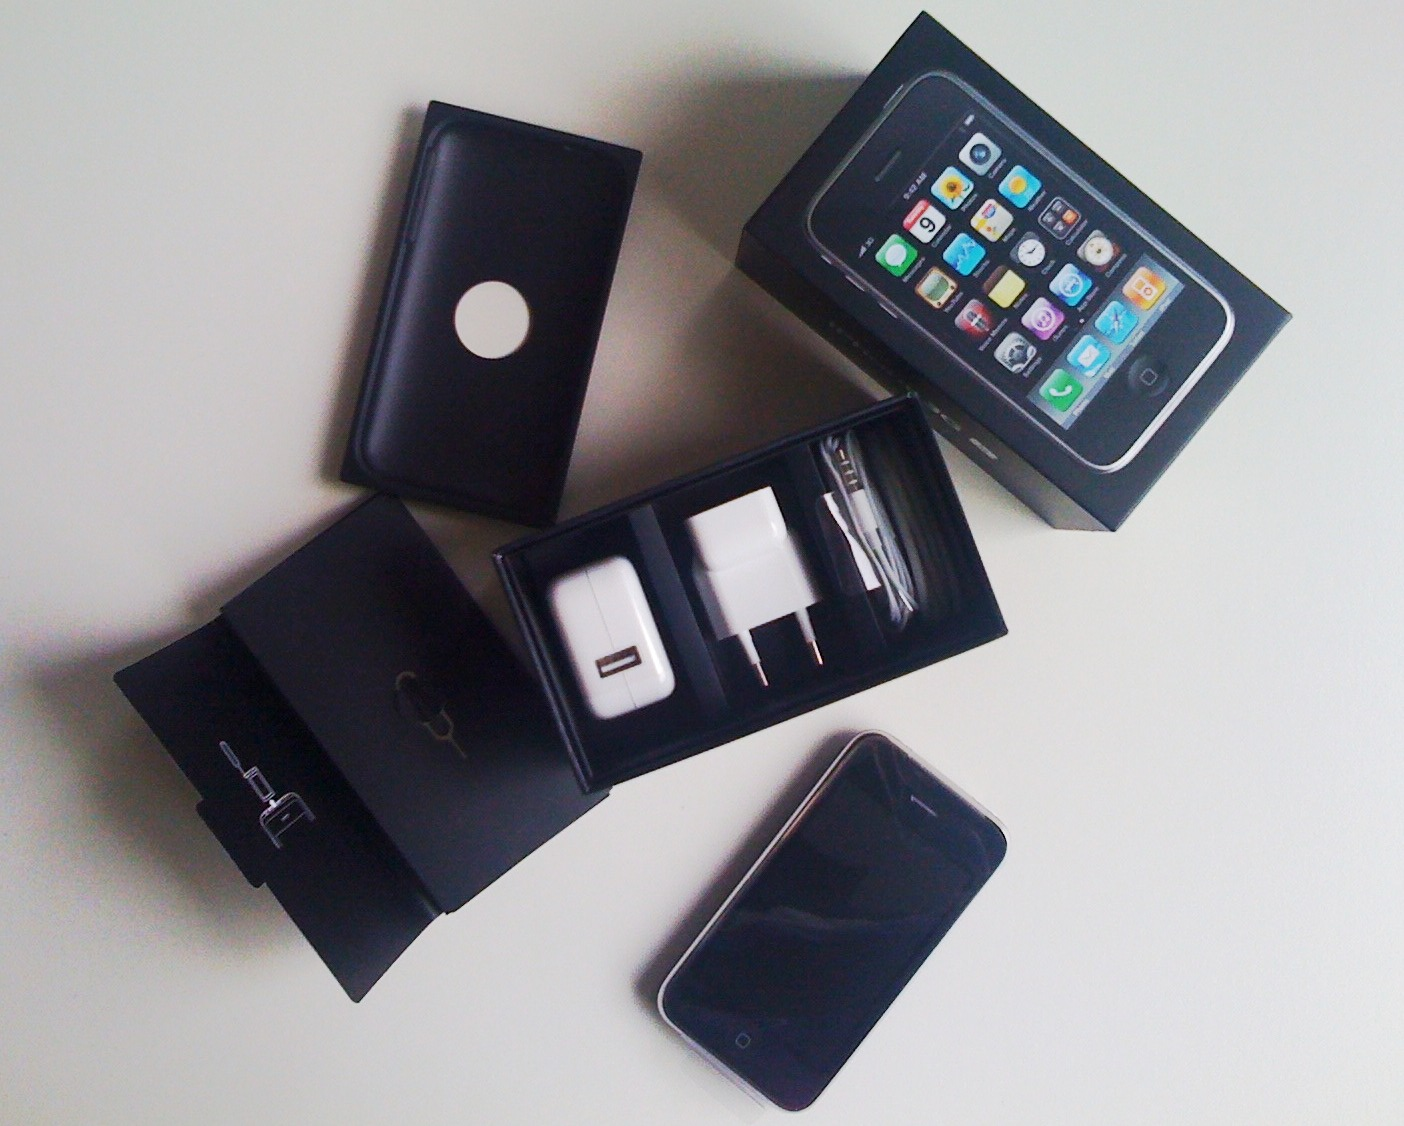 das iphone 3g s erste eindr cke iphone fan. Black Bedroom Furniture Sets. Home Design Ideas